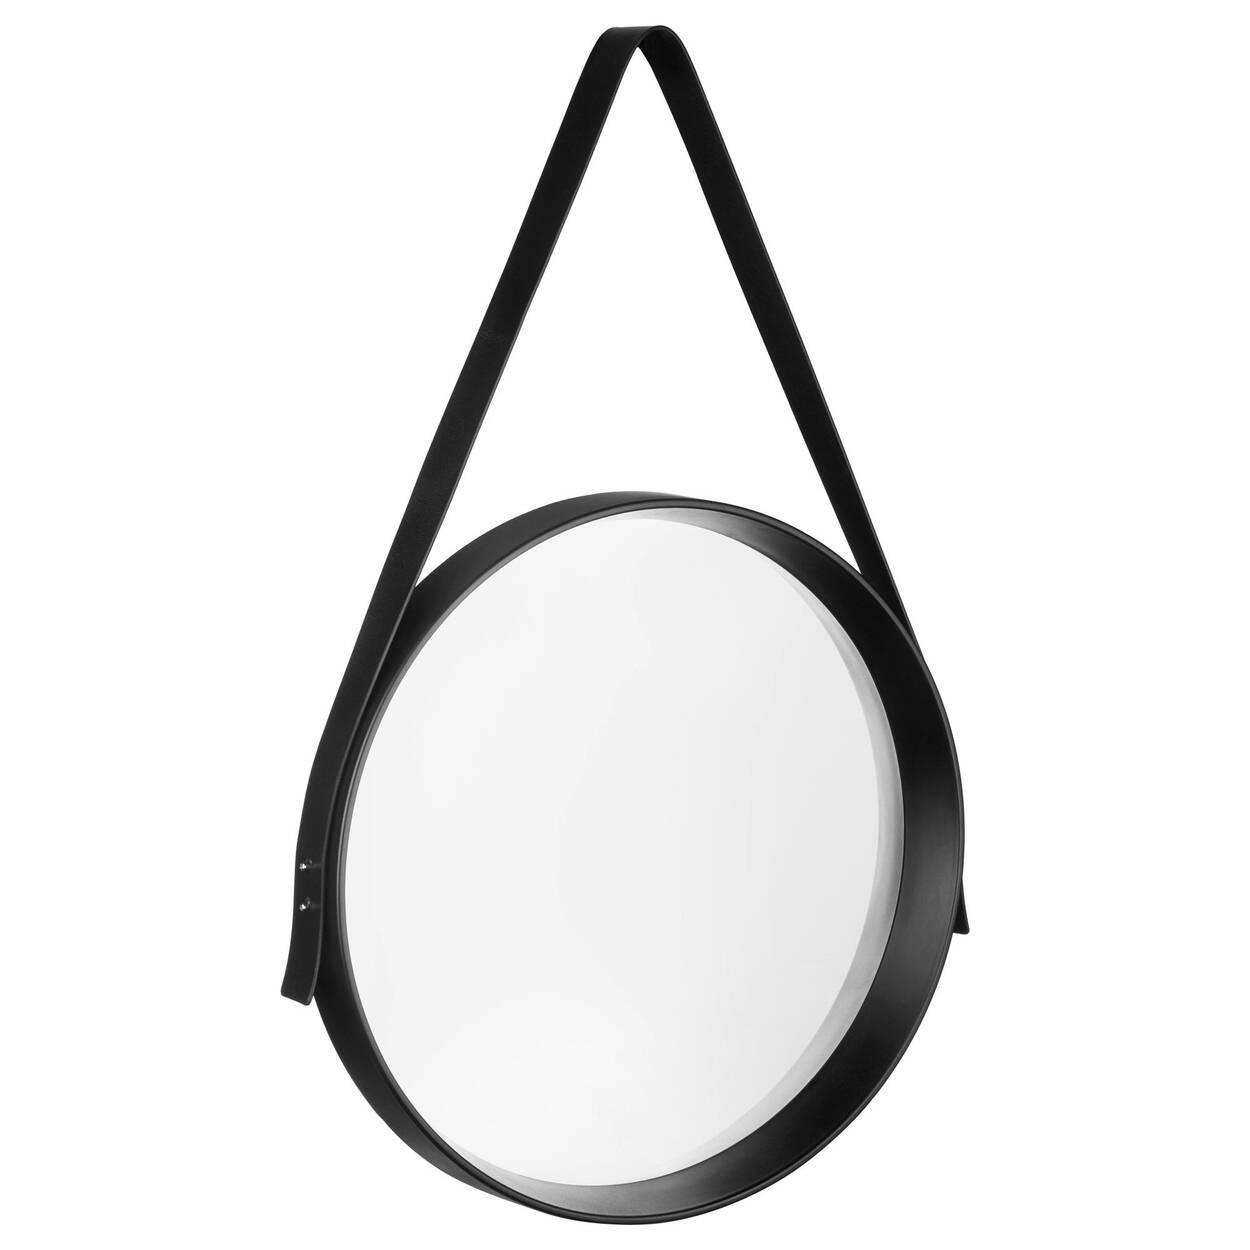 miroir rond suspendu. Black Bedroom Furniture Sets. Home Design Ideas